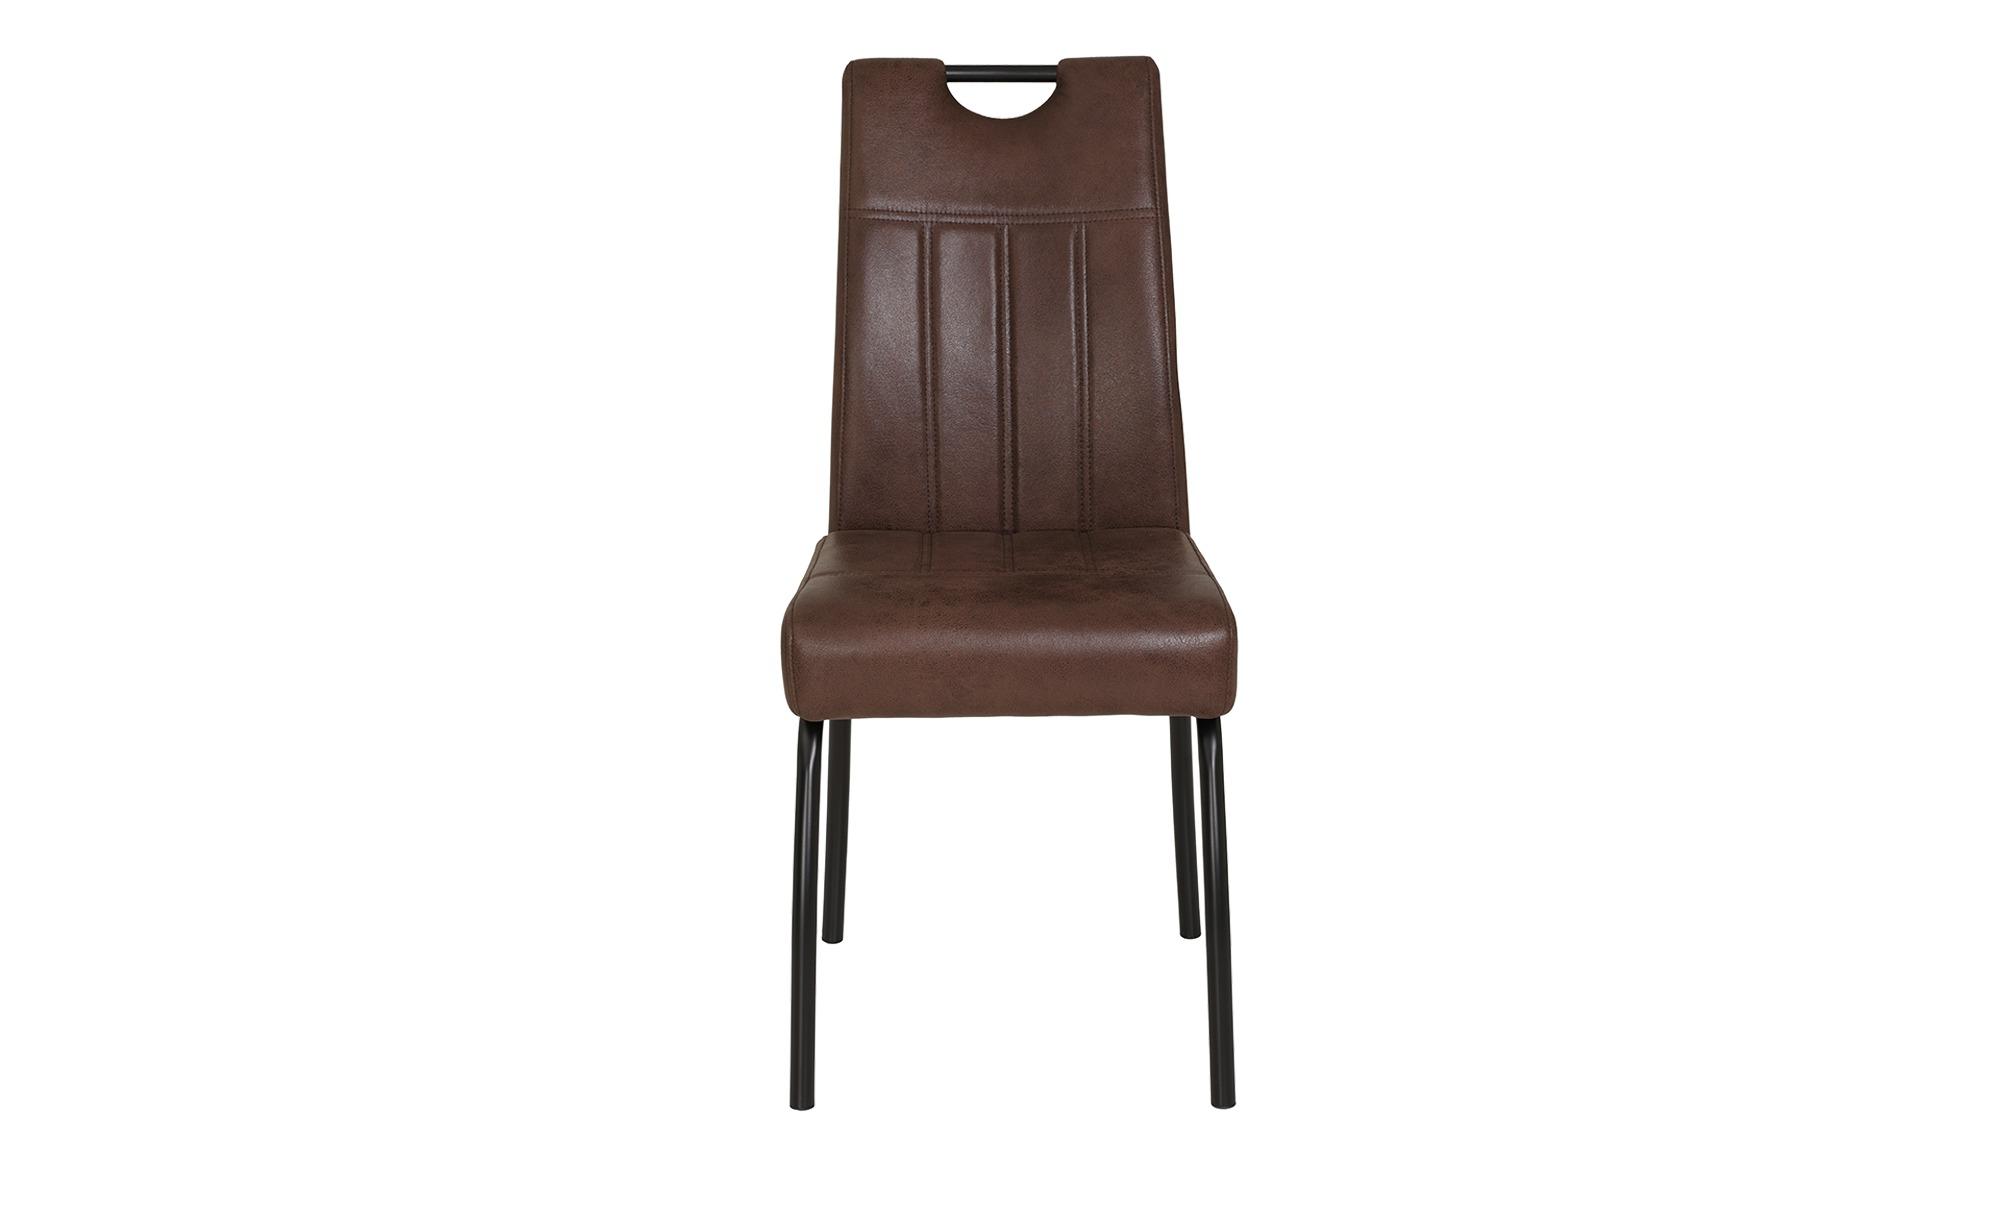 4-Fuß-Stuhl  Beate - braun - Sconto